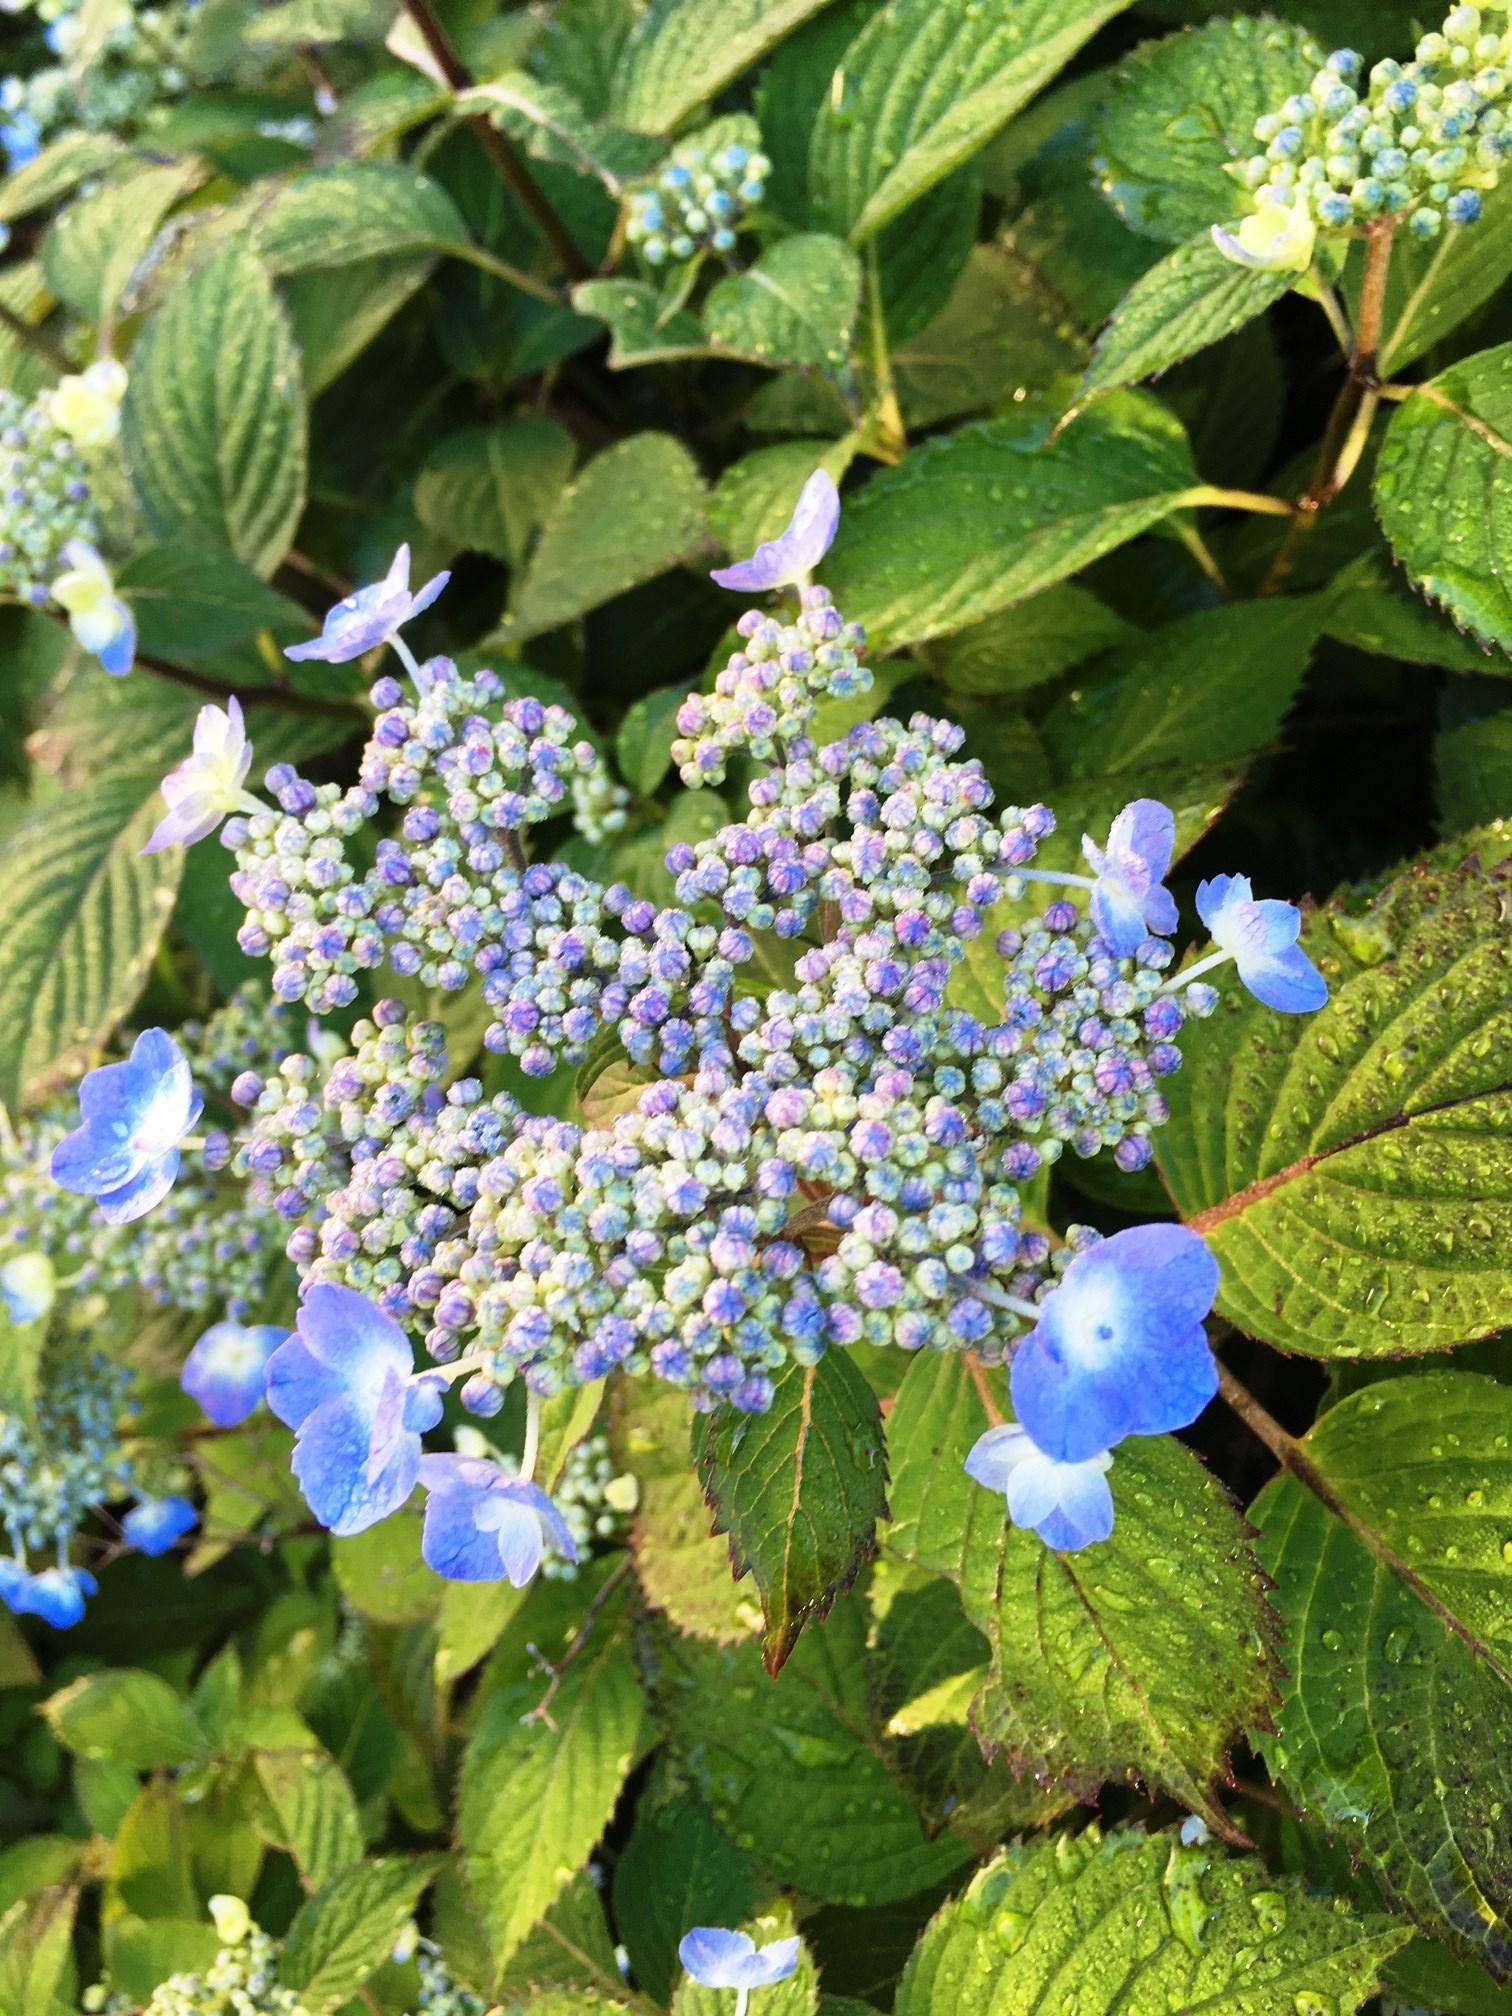 Https Uconnladybug Wordpress Com 2020 05 01 May Wildflowers